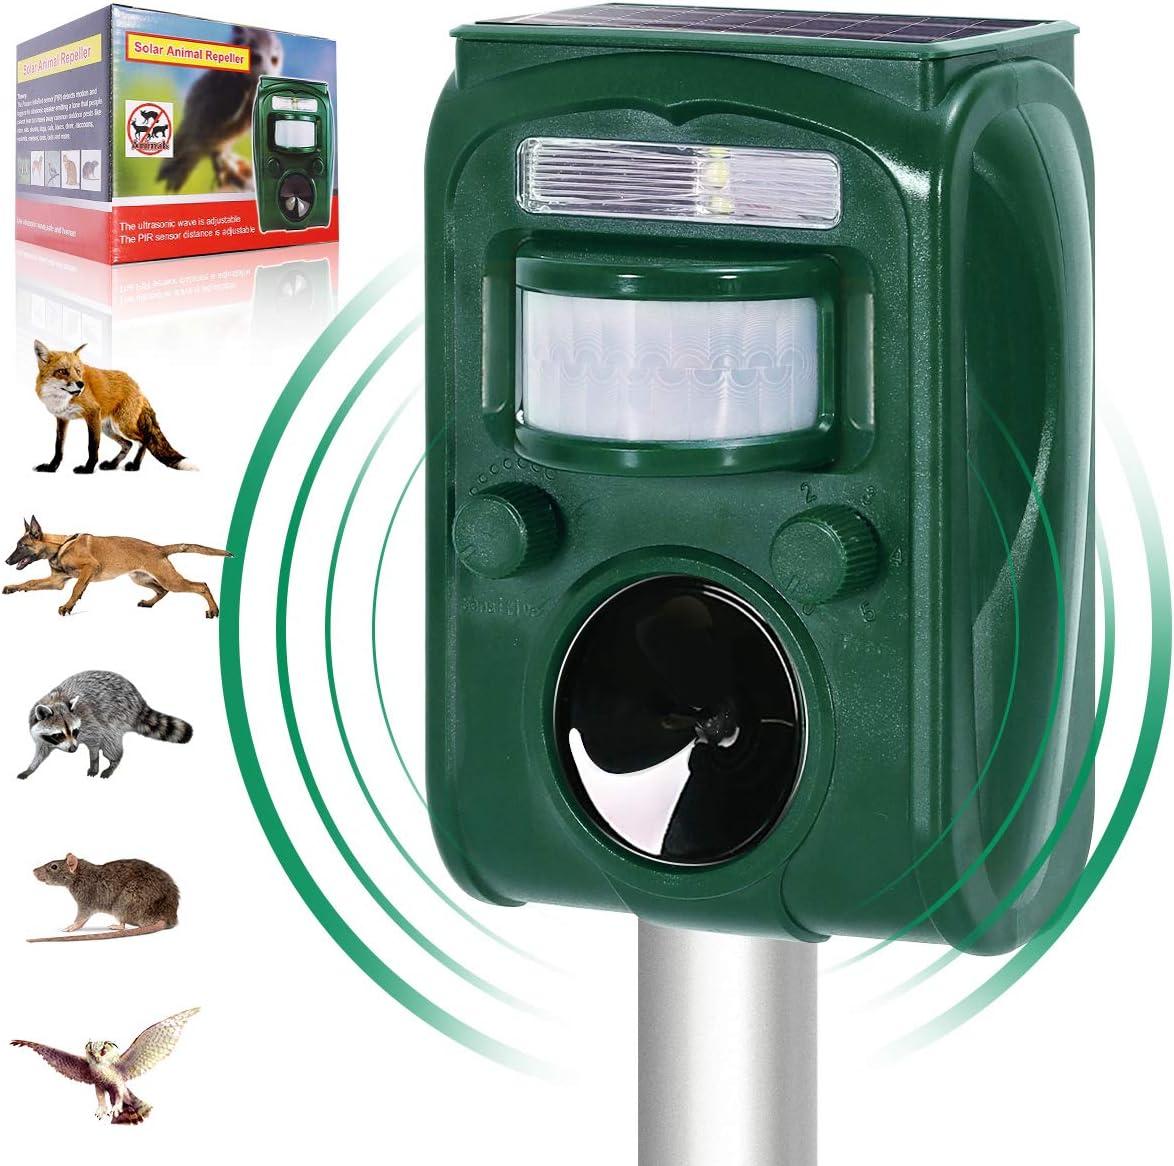 Vboer Outdoor Solar Ultrasonic Animal Repeller, with Motion Sensor and Flash Intimidationcat ,Dog, Raccoon, Rabbit, Squirrel, Fox, Birds, Skunks, etc Protect The Farm Garden Yard